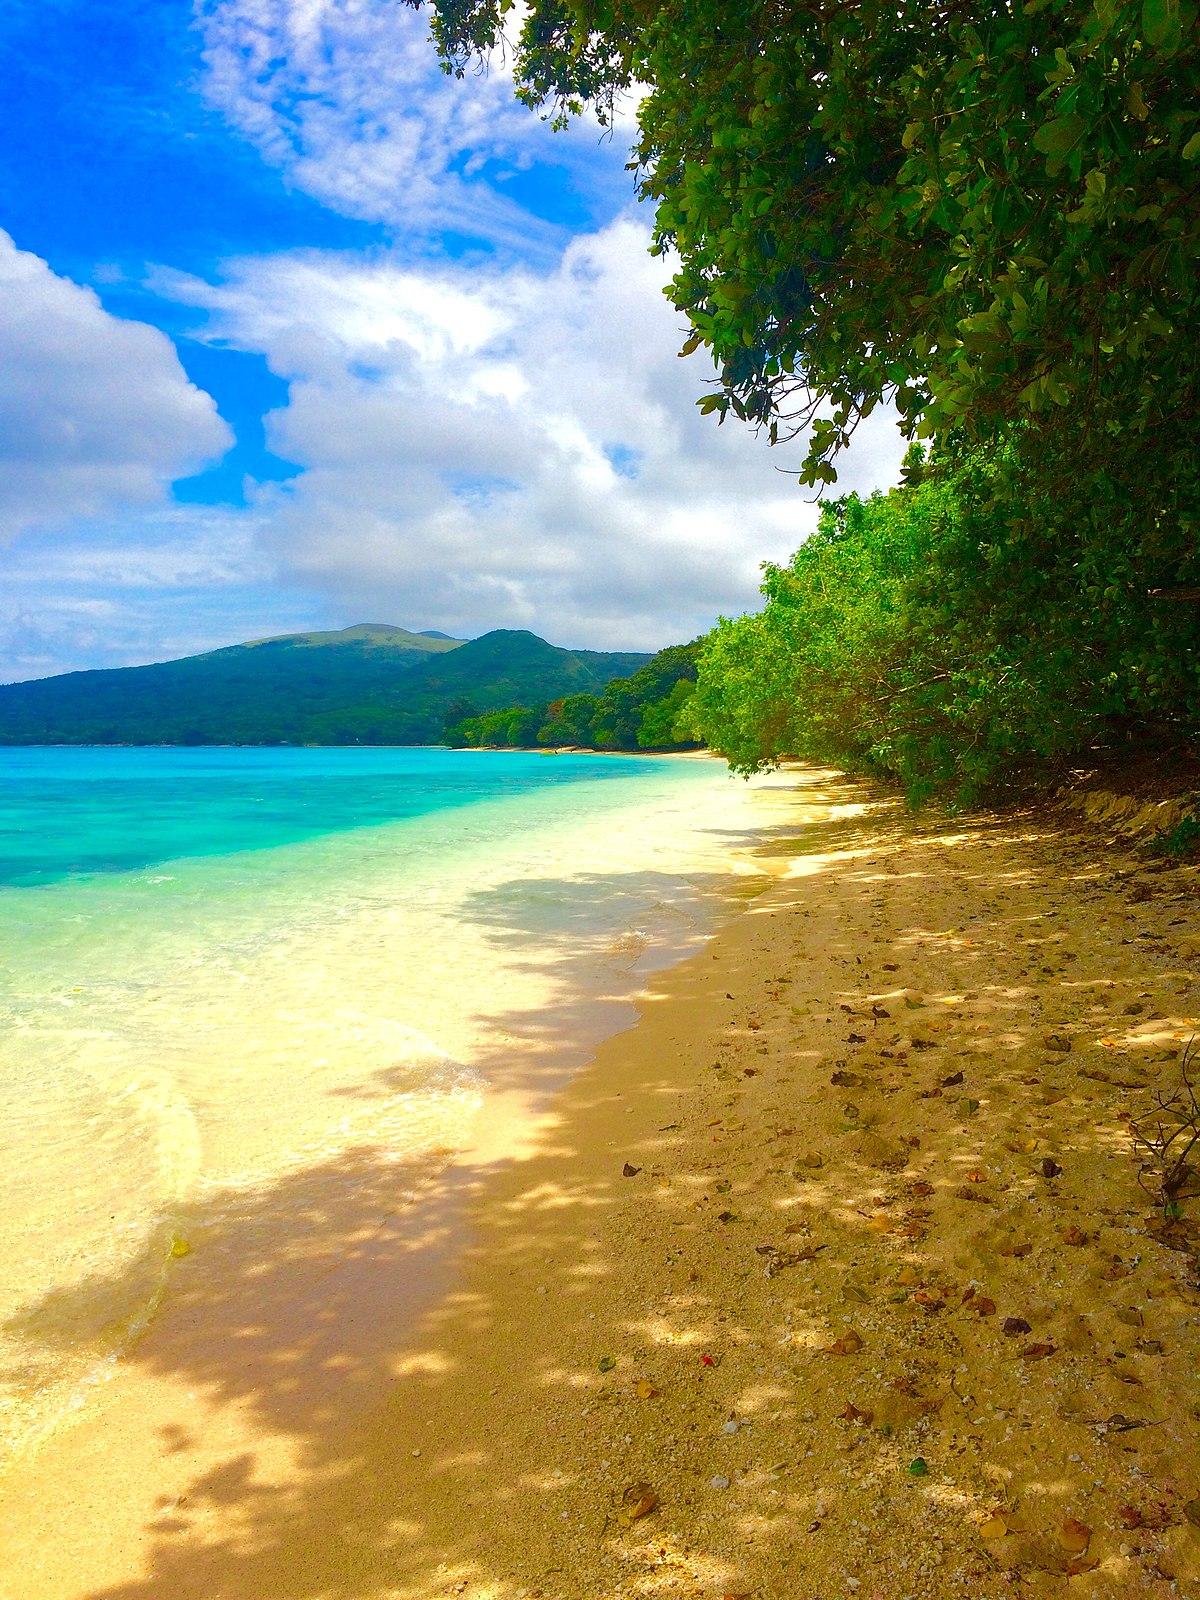 Pele Island - Wikipedia